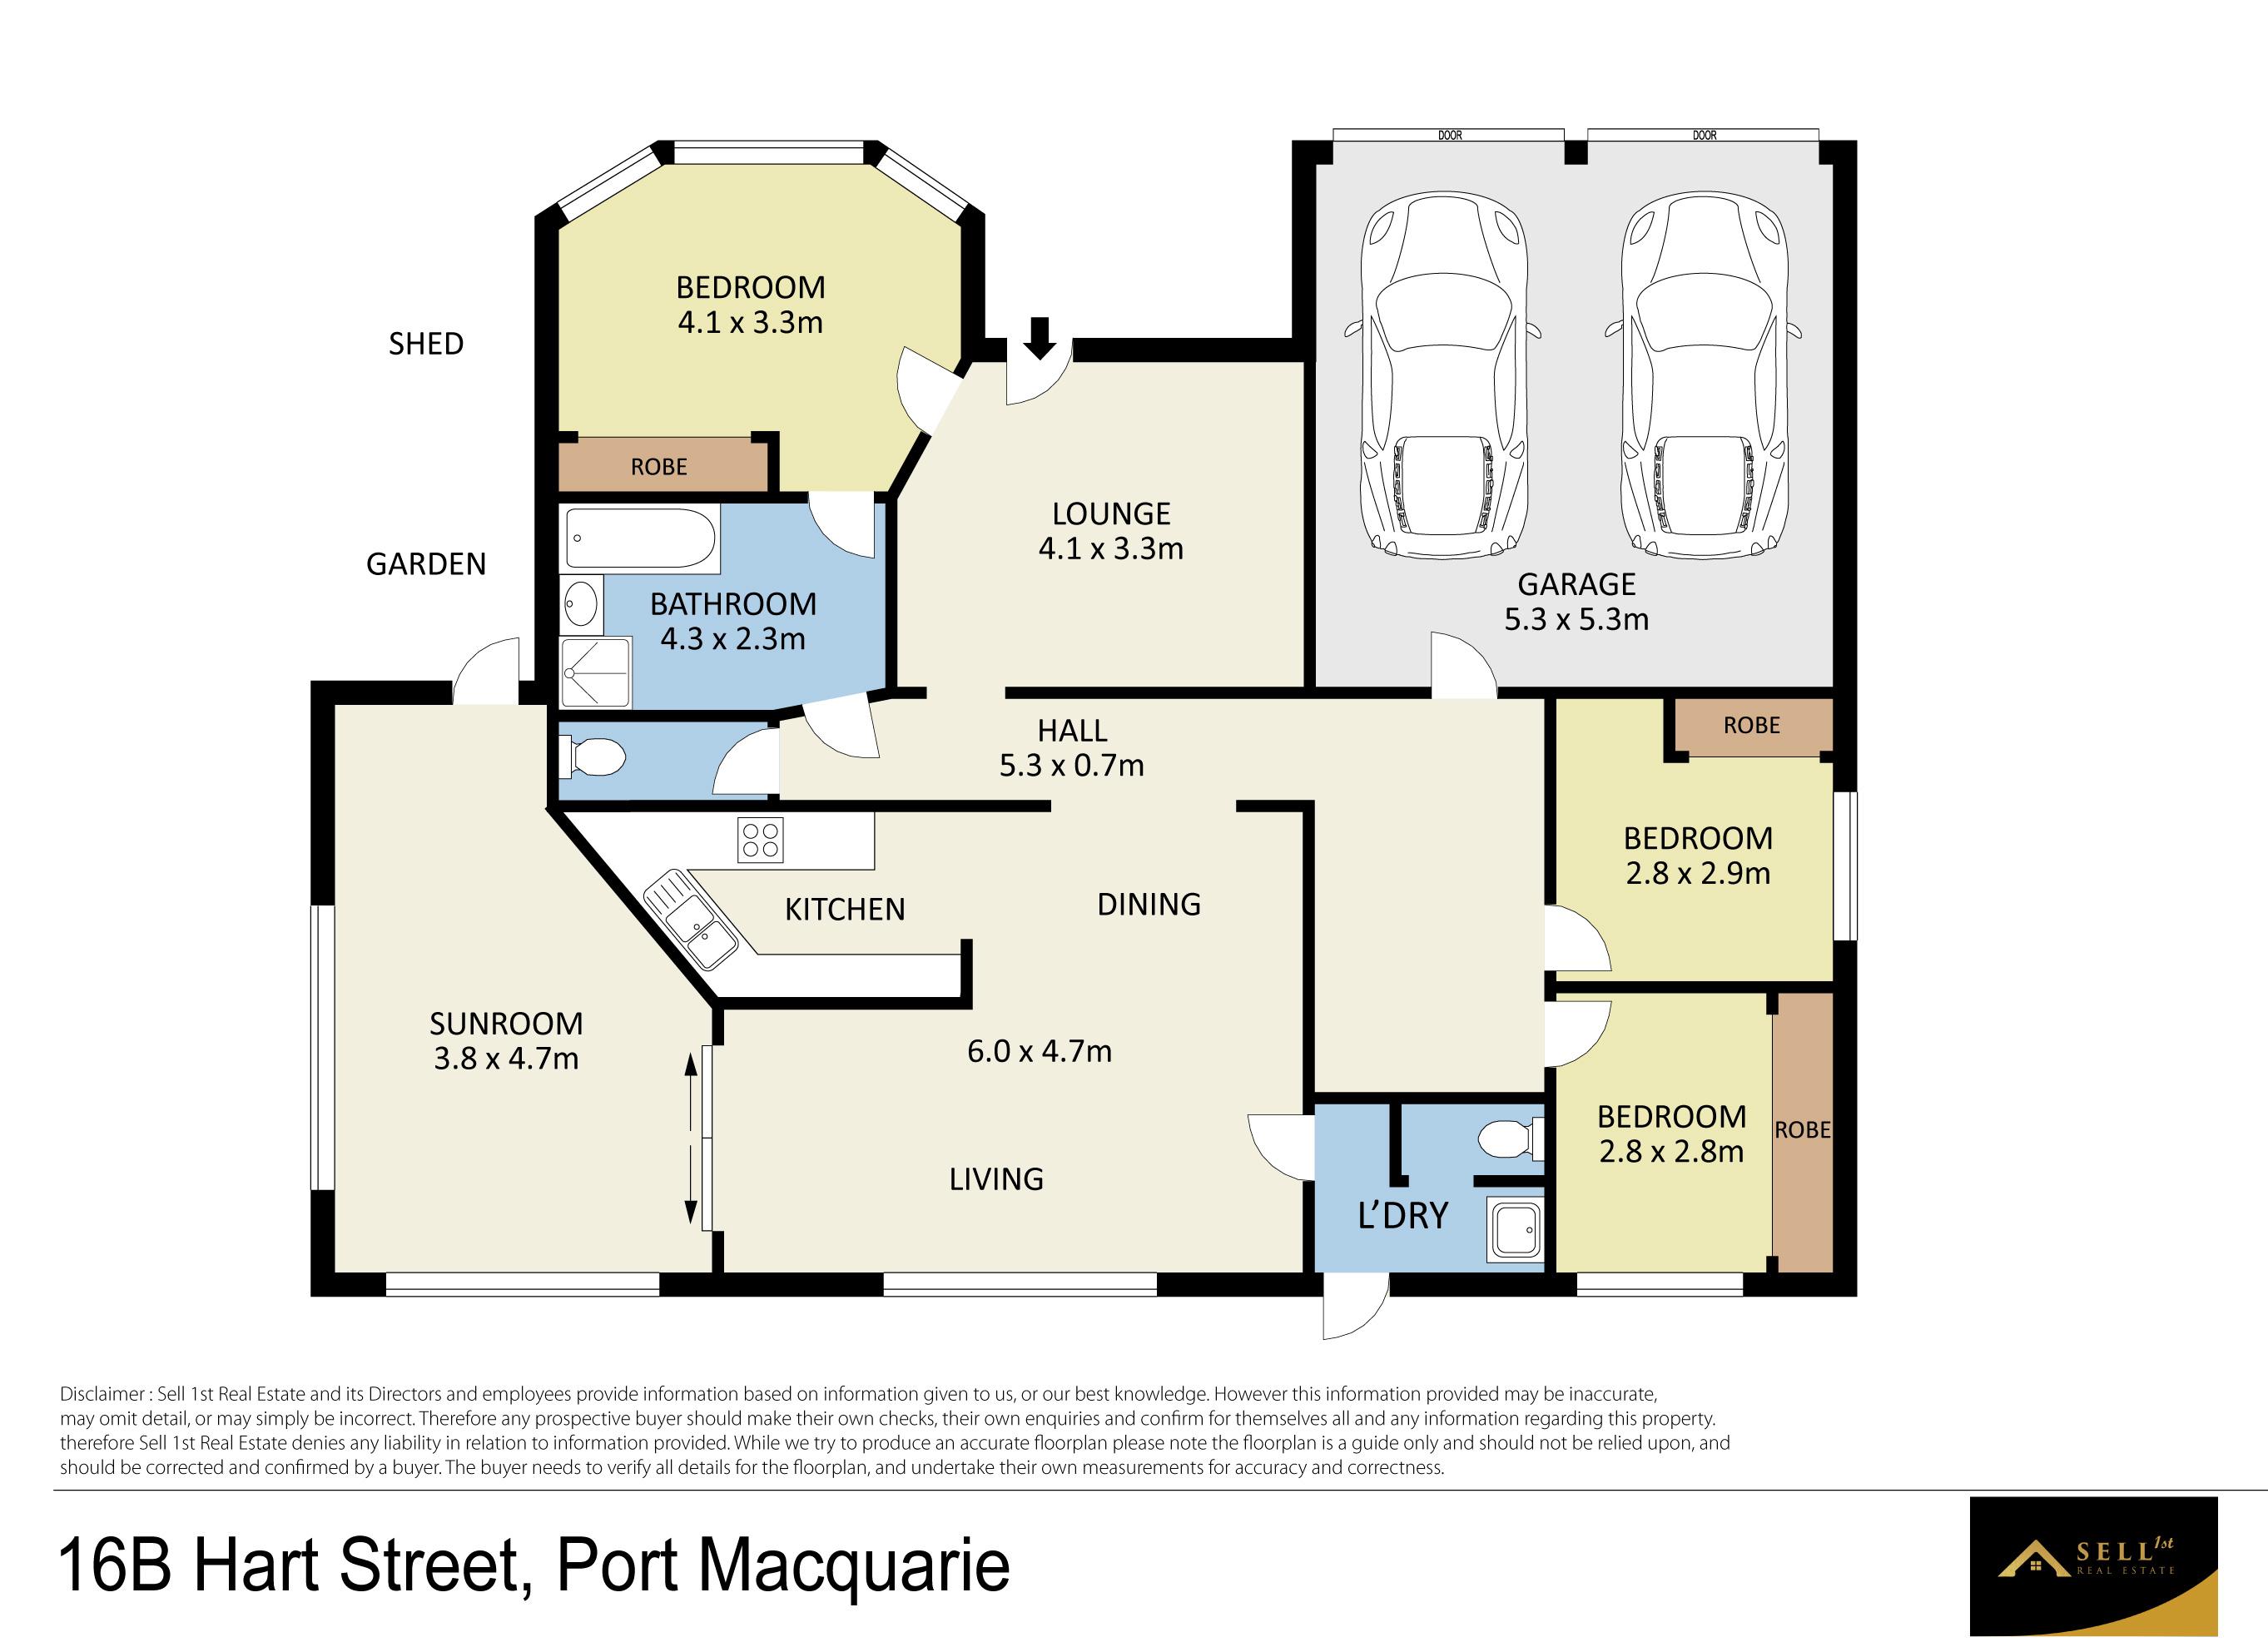 Property Report for 16b Hart Street, Port Macquarie NSW 2444